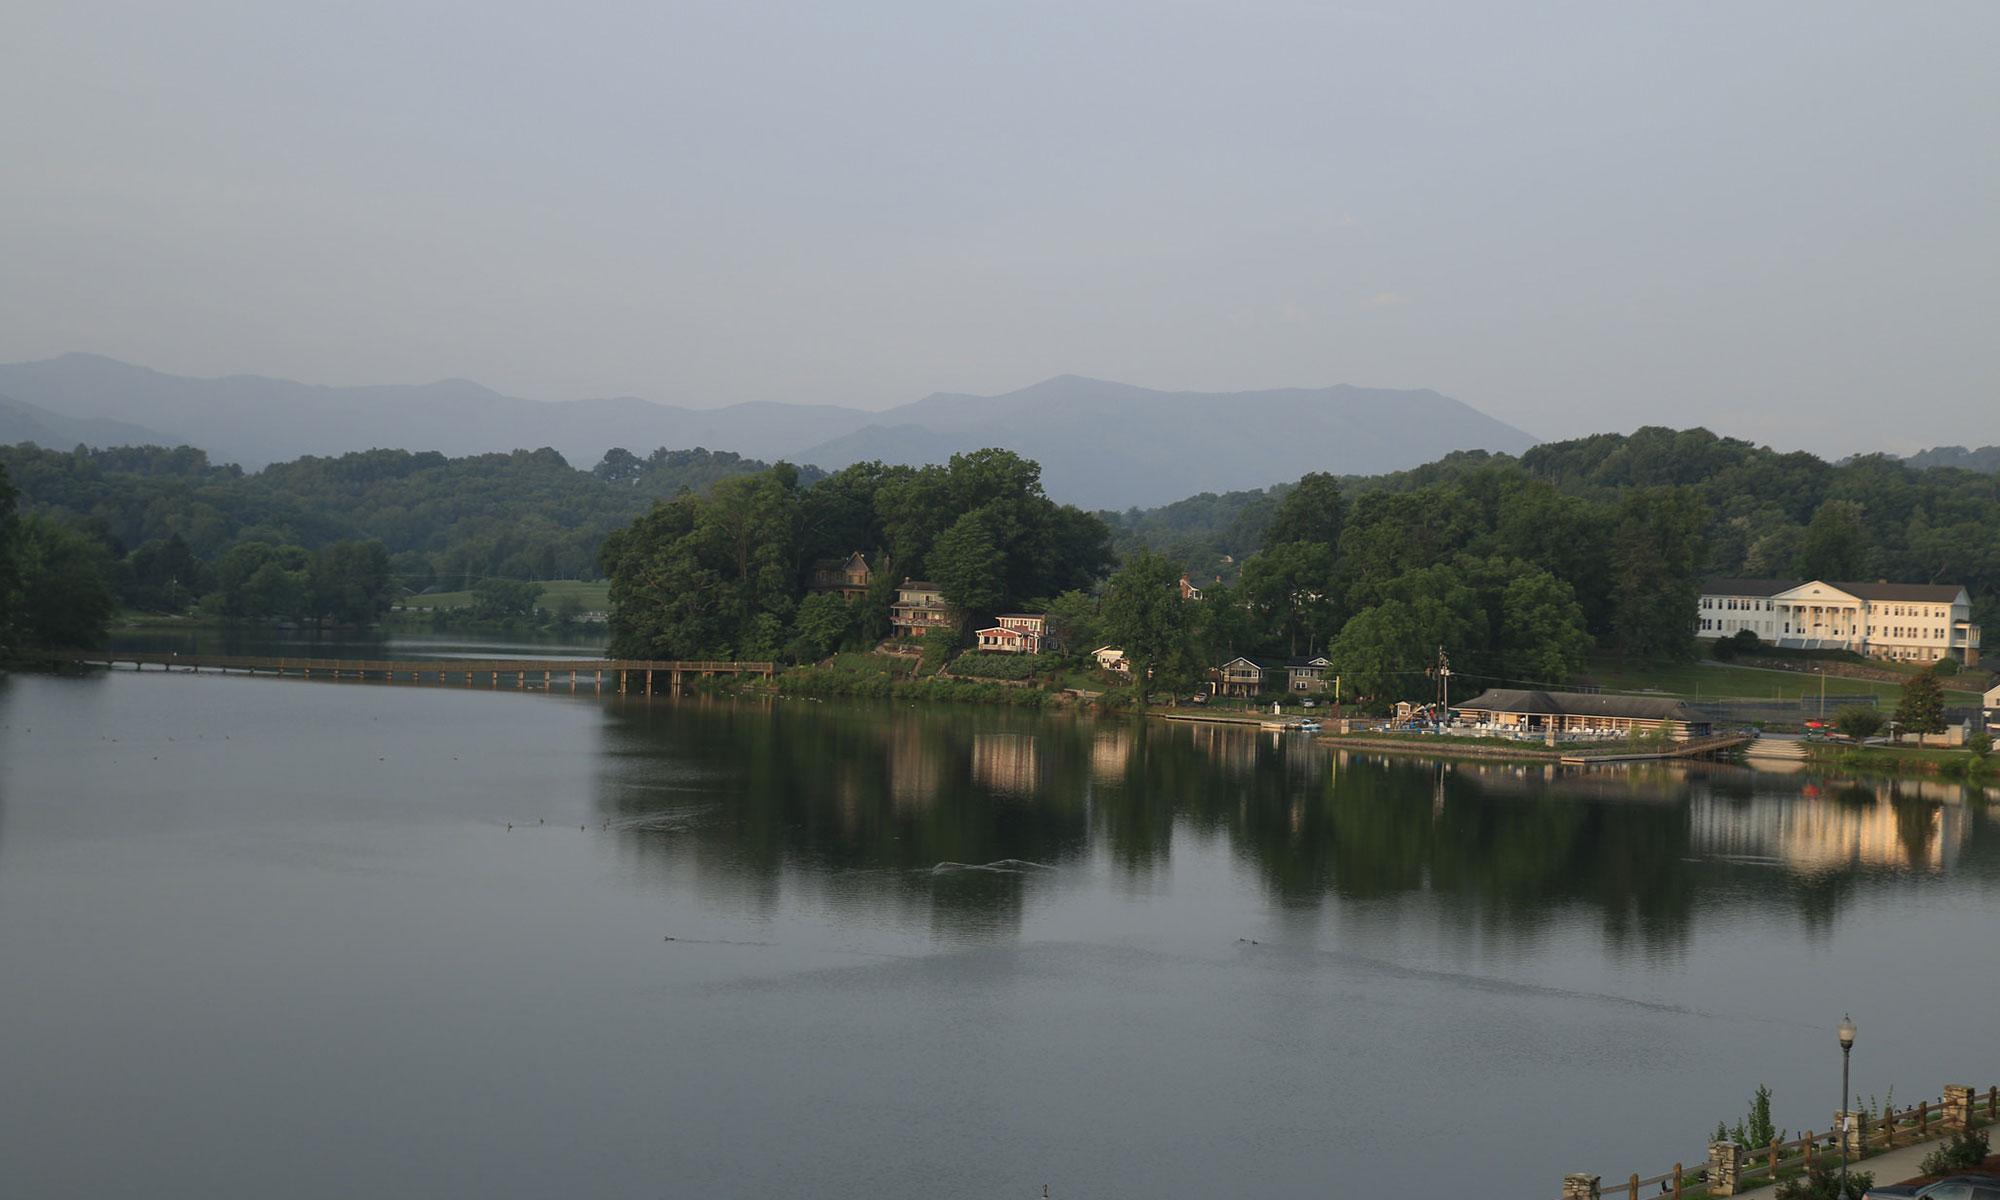 Accommodations at Lake Junaluska